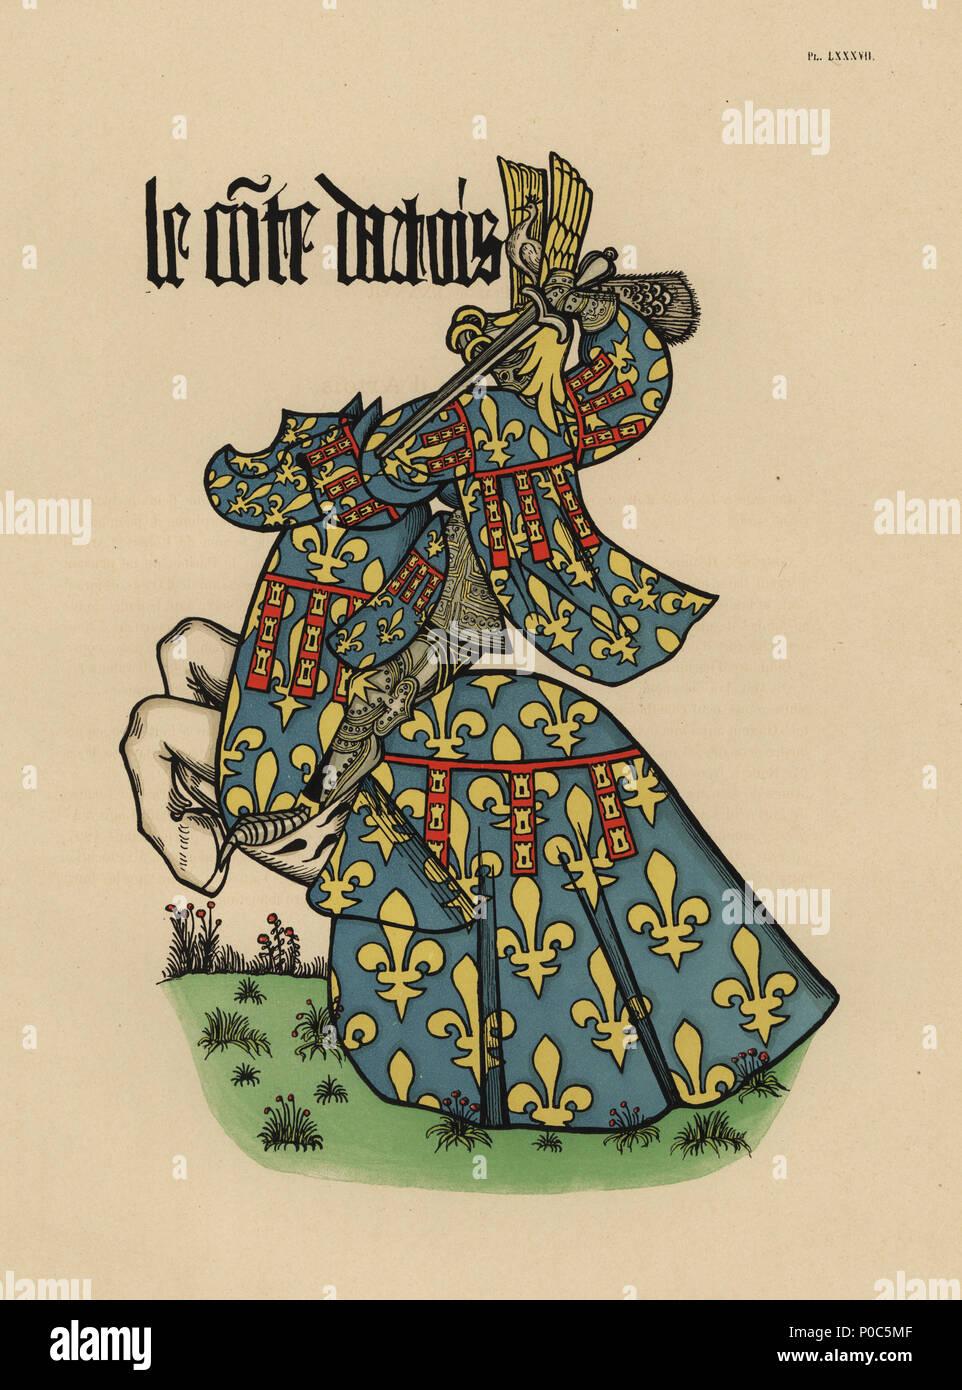 Count of Artois, Comte d'Artois. Chromolithograph from Loredan Larchey's Ancien Armorial Equestre de la Toison d'Or et de l'Europe au 15e siecle (Ancient Equestrian Armorials of the Order of the Golden Fleece and Europe in the 15th century), Paris, 1890. From illustrated manuscript 4790 in the Bibliotheque de l'Arsenal. - Stock Image